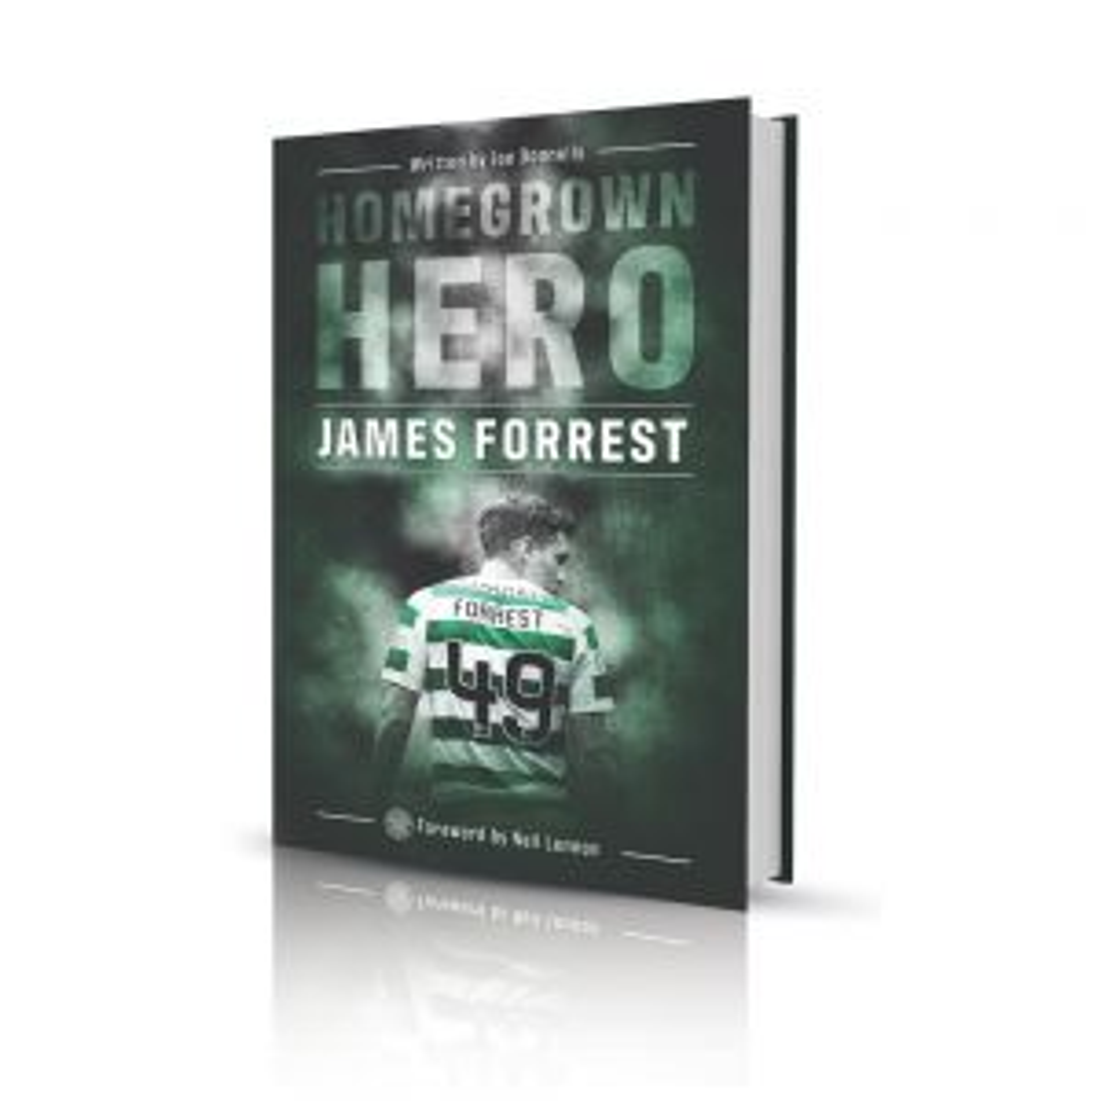 Homegrown Hero - James Forrest Book